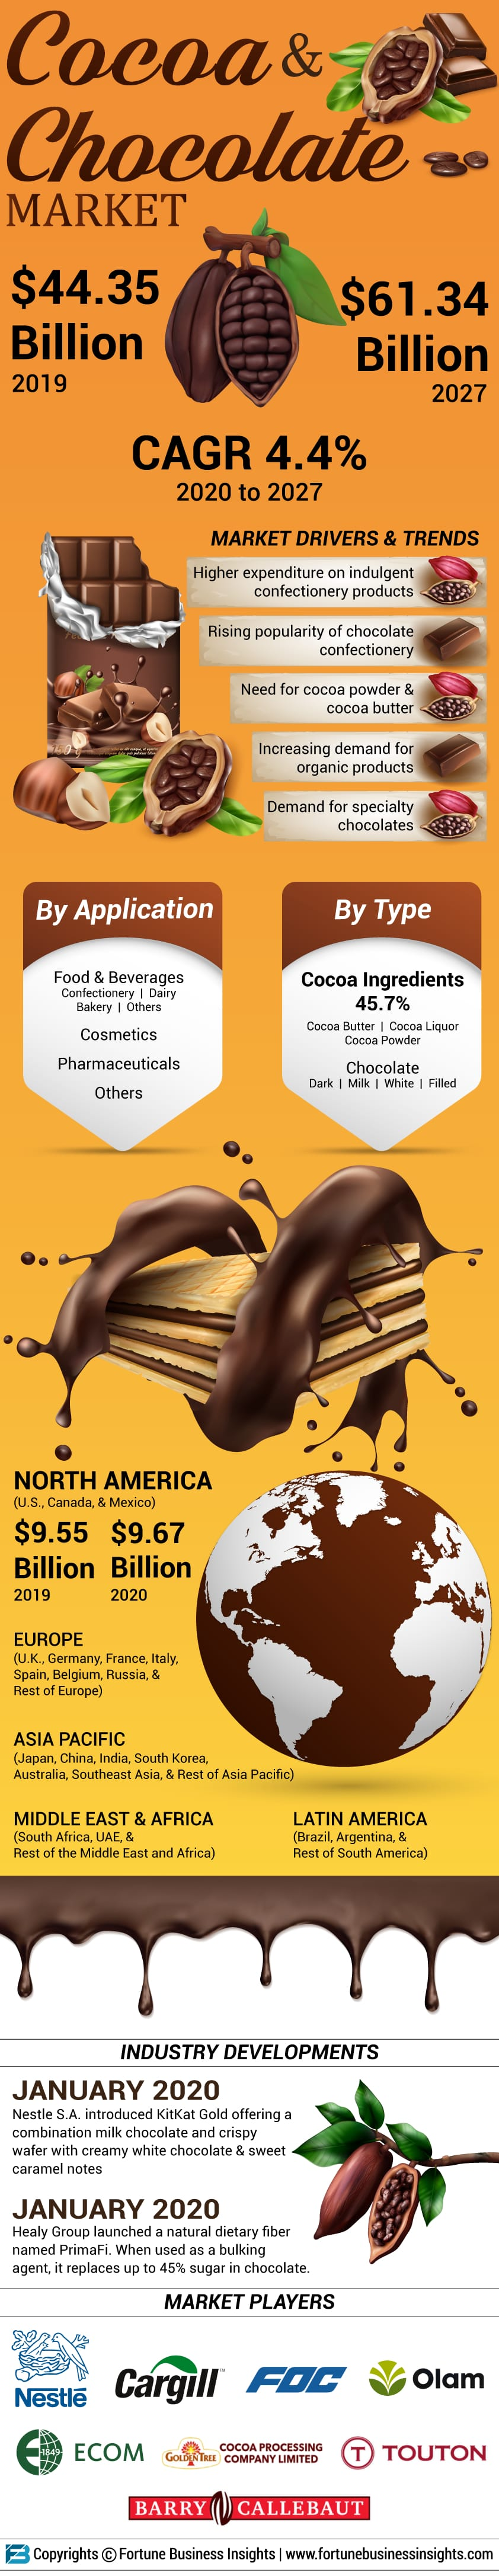 Cocoa and Chocolate Market